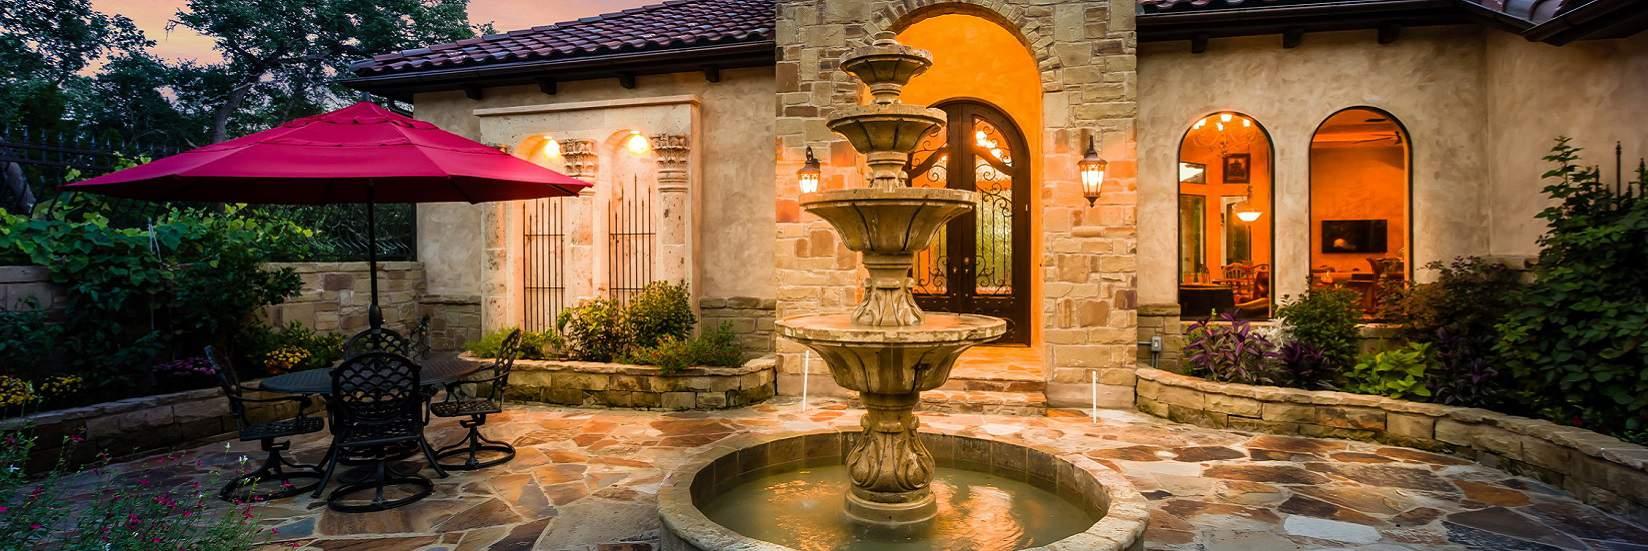 Custom Home Builder New Braunfels San Antonio Hill Country - Luxury home builders san antonio